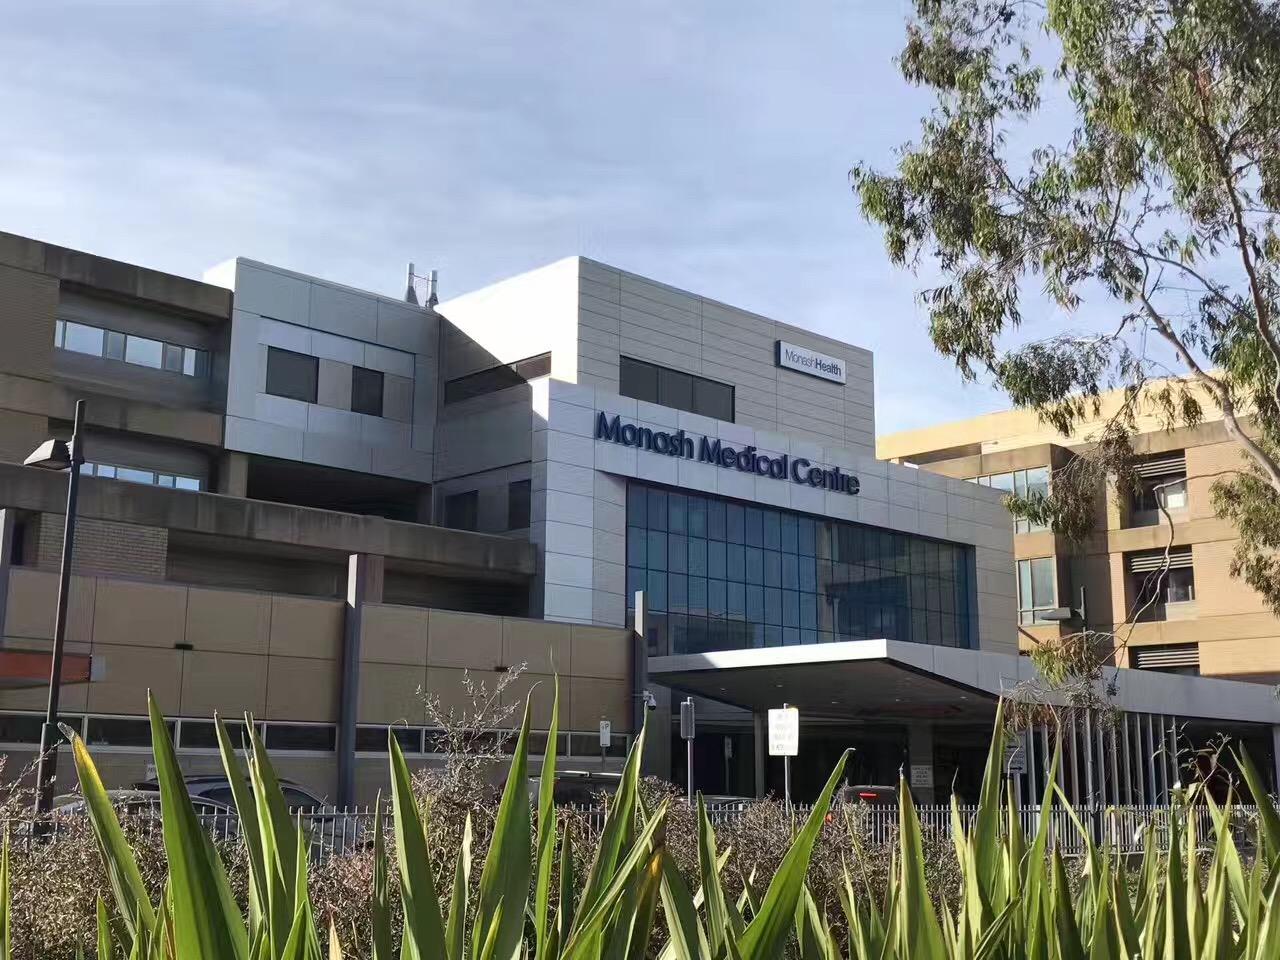 PURECELL 澳大利亚纯净细胞再生医学集团